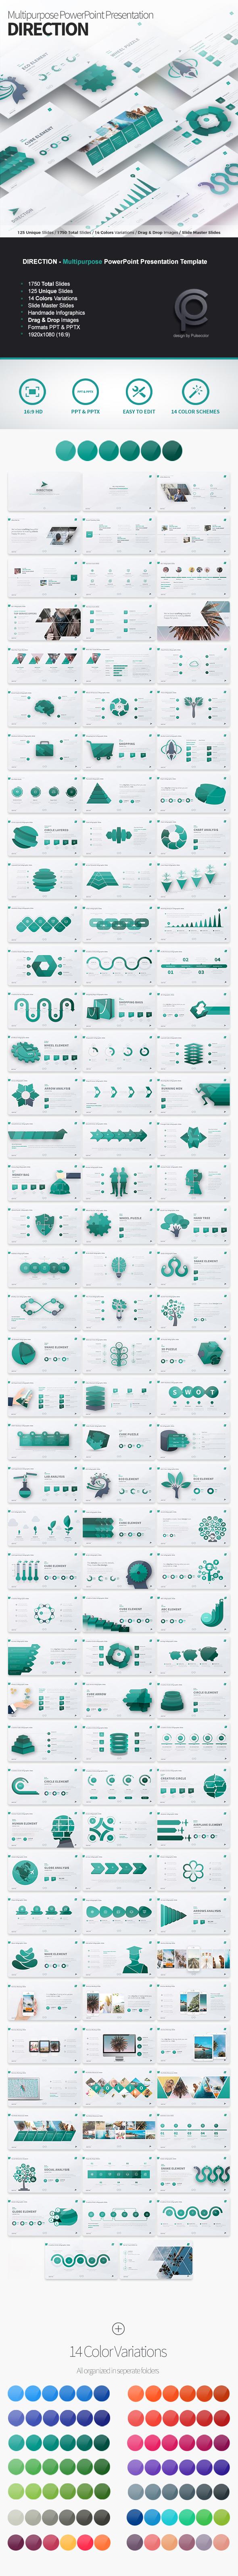 DIRECTION - Multipurpose PowerPoint Presentation - Business PowerPoint Templates